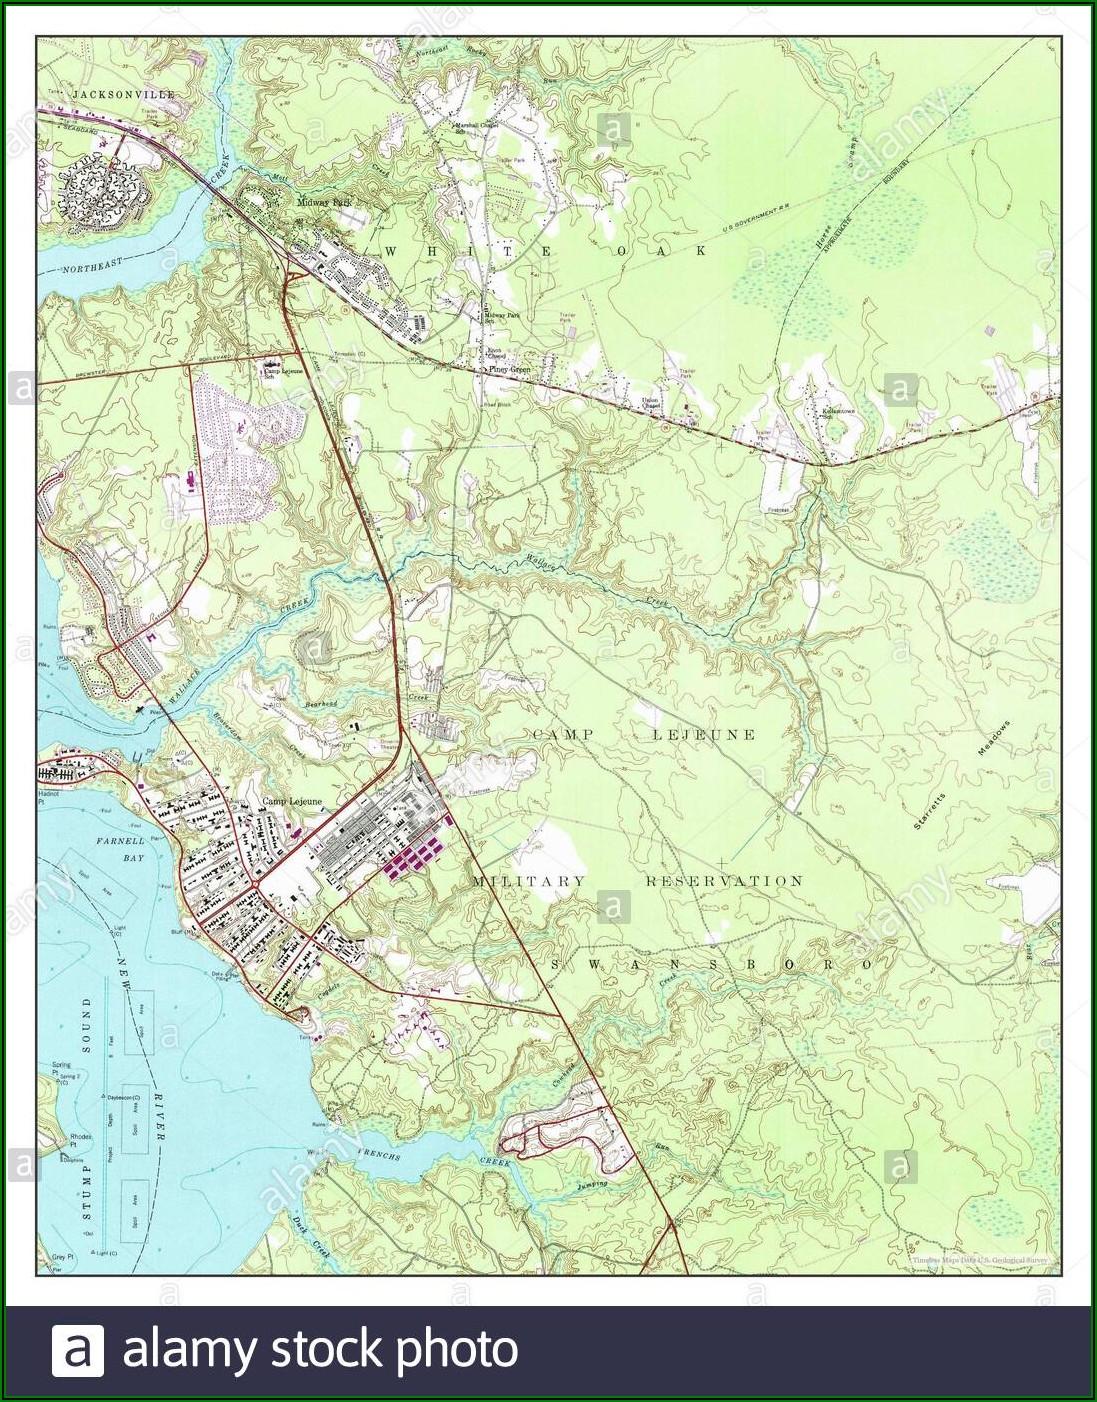 Camp Lejeune Base Hunting Map